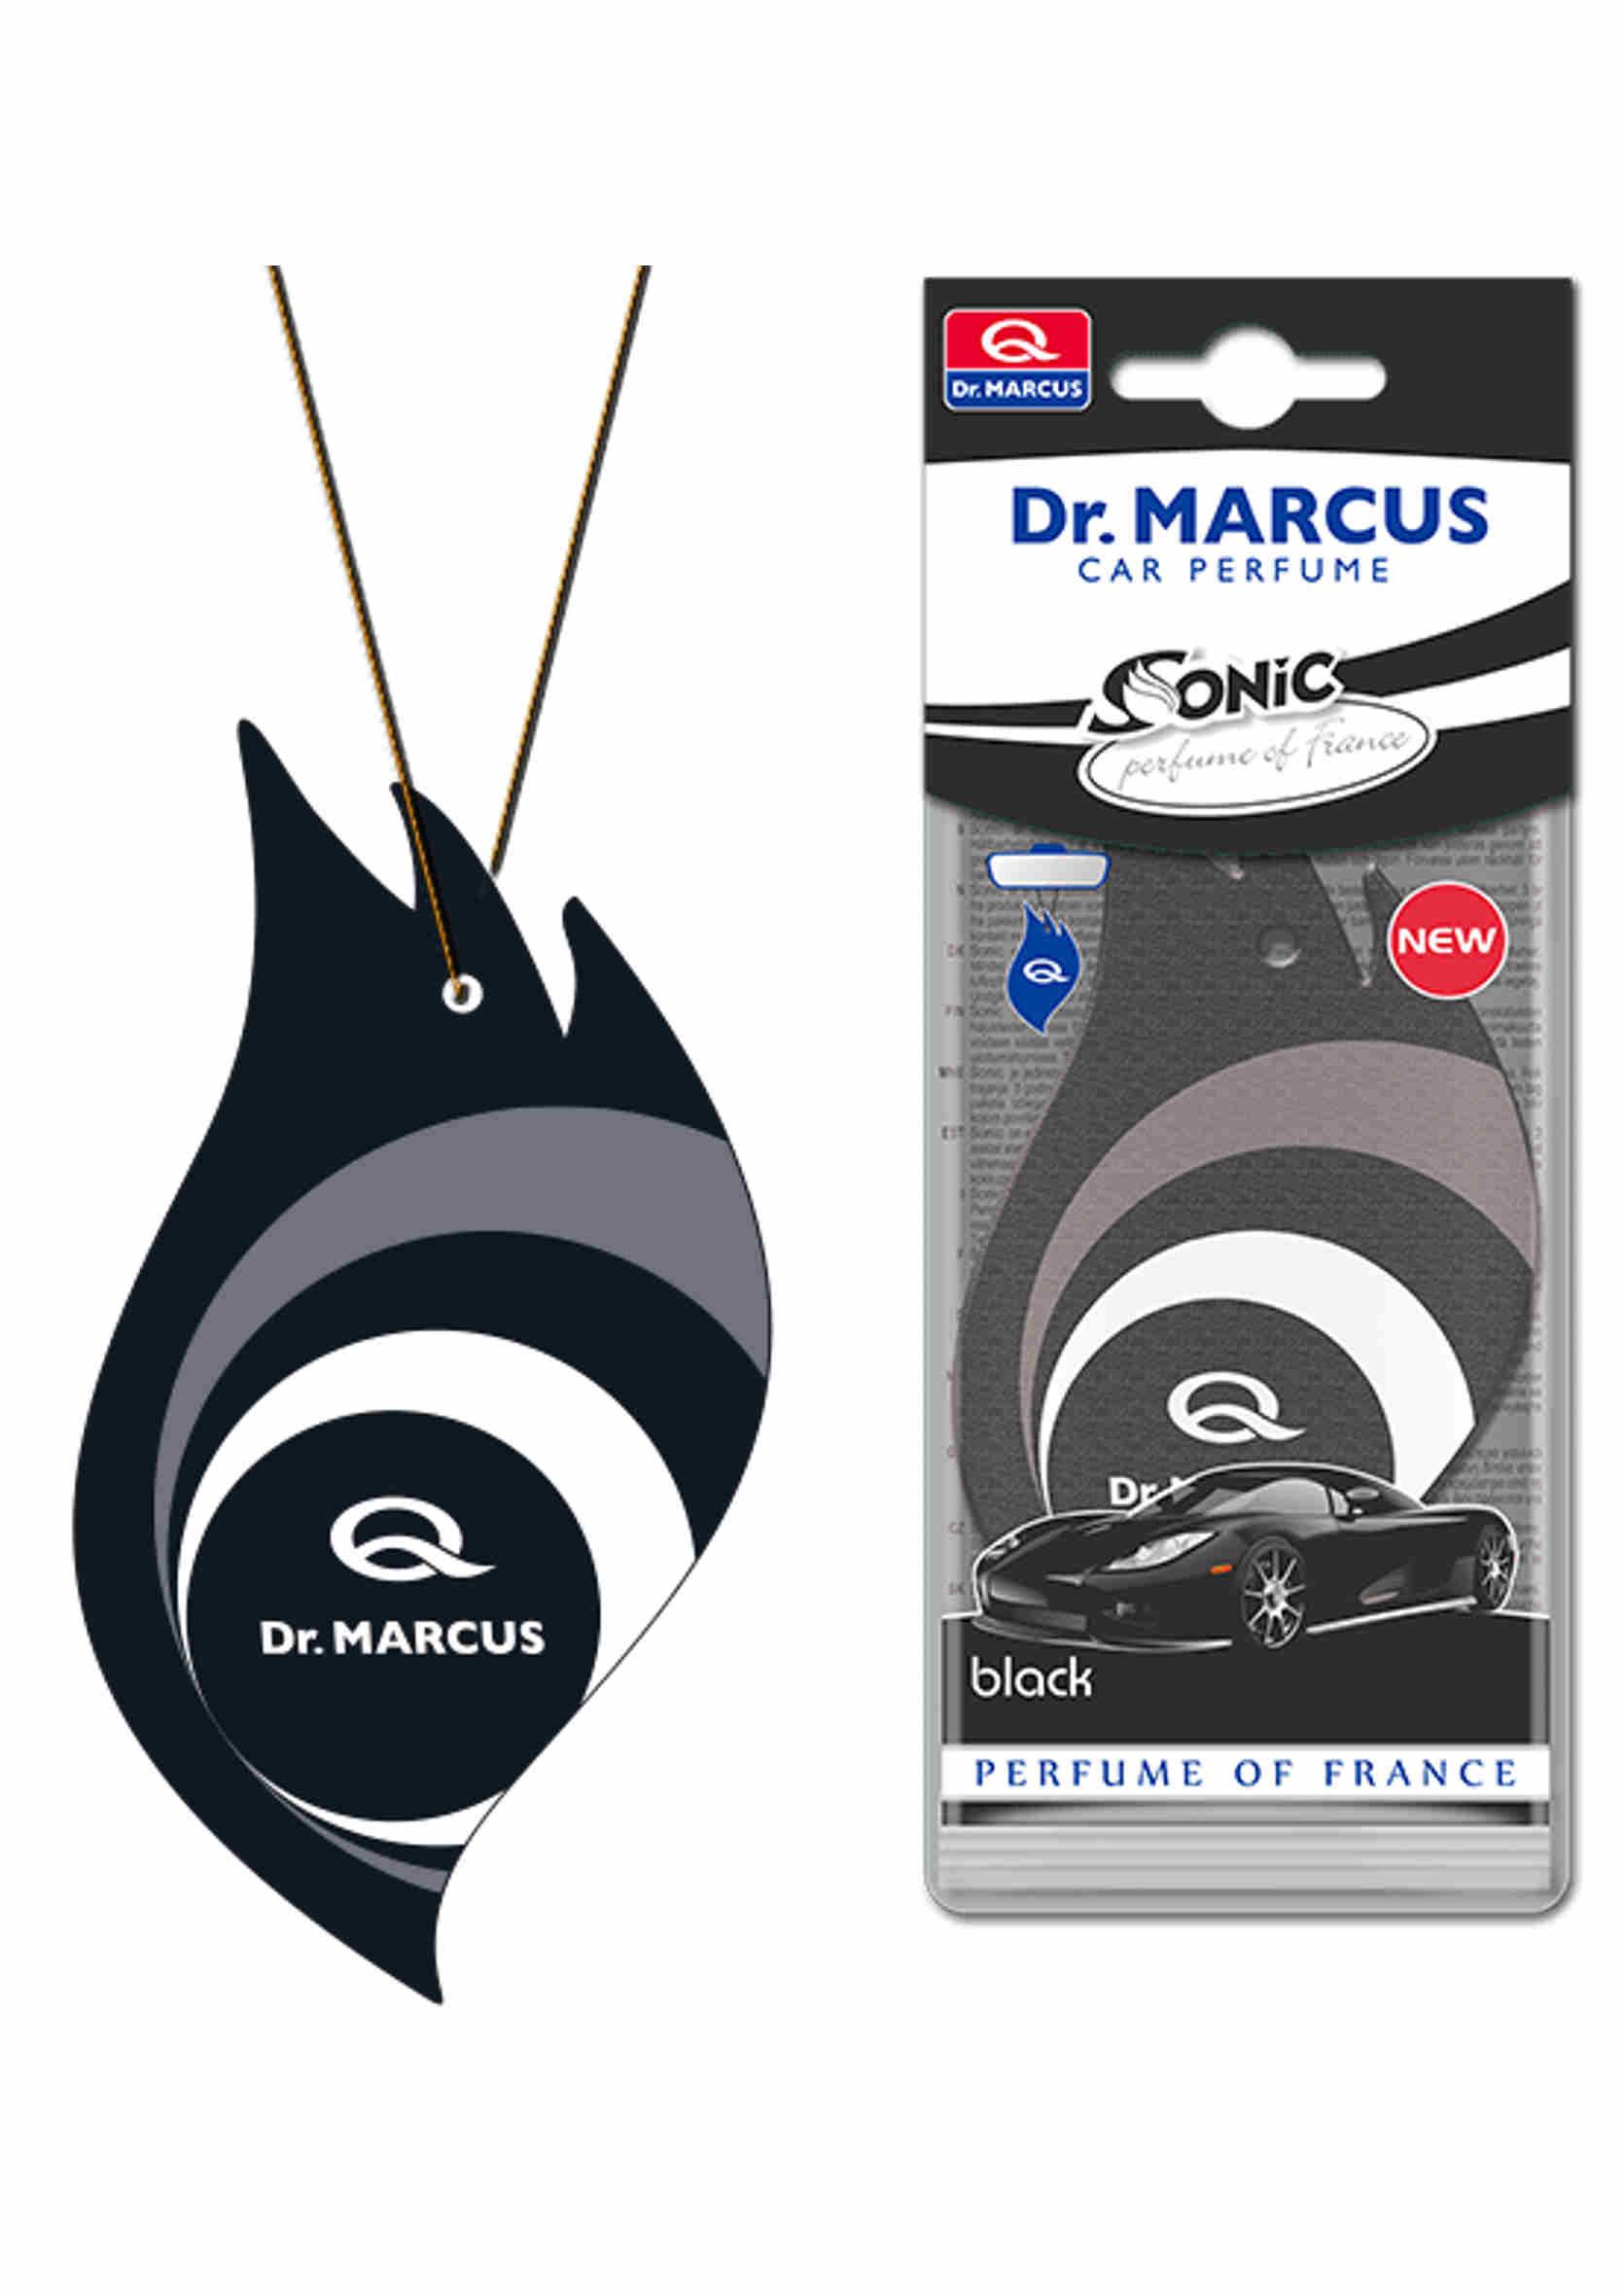 Dr. Marcus Sonic Black Listek Zapachowy Choinka Perfumowana